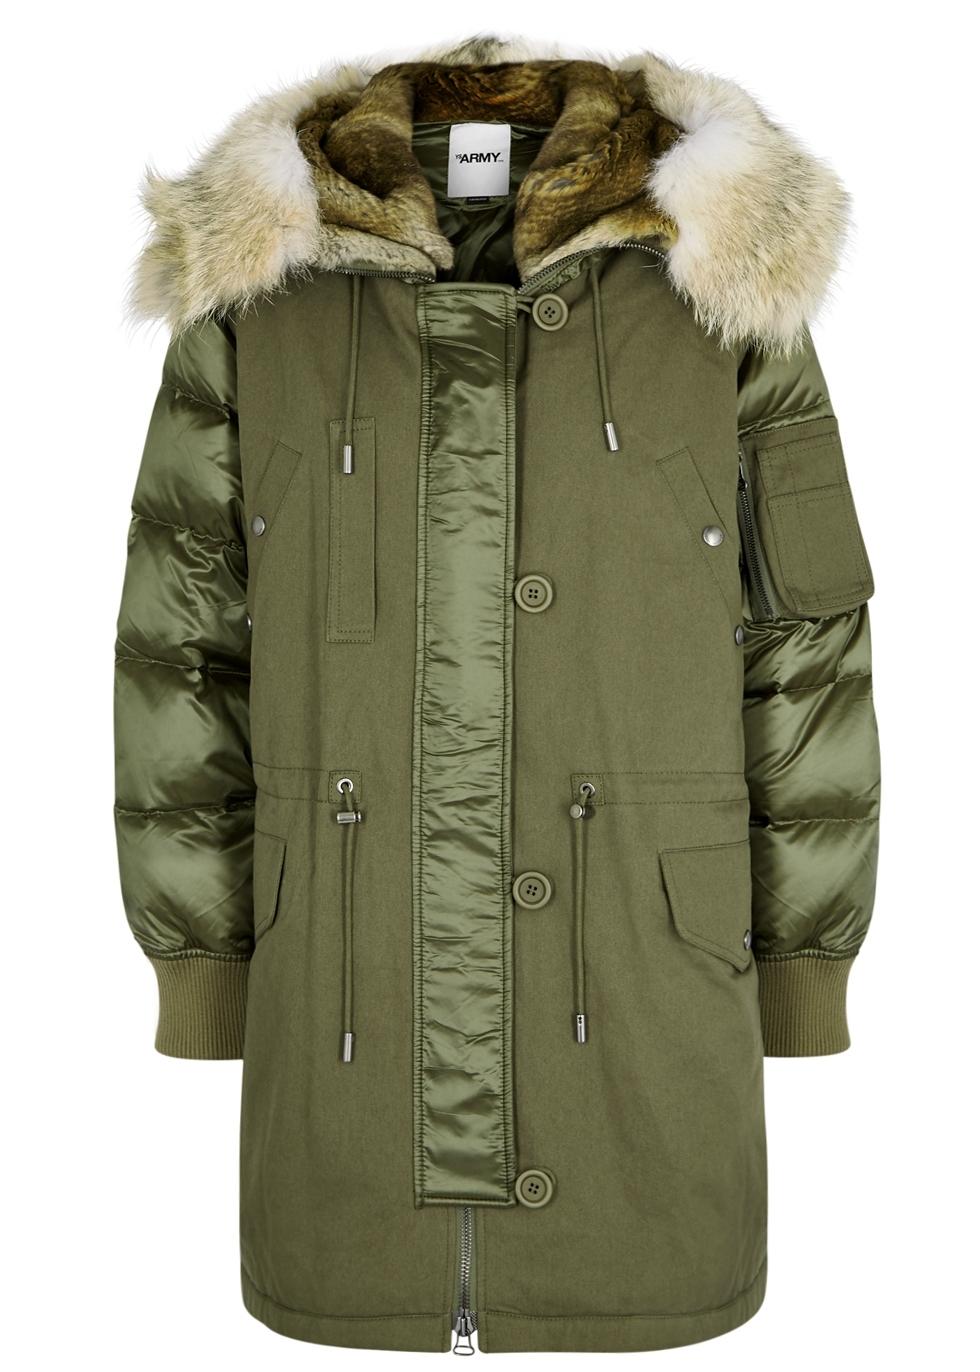 844dff233dd Designer Coats - Women s Winter Coats - Harvey Nichols